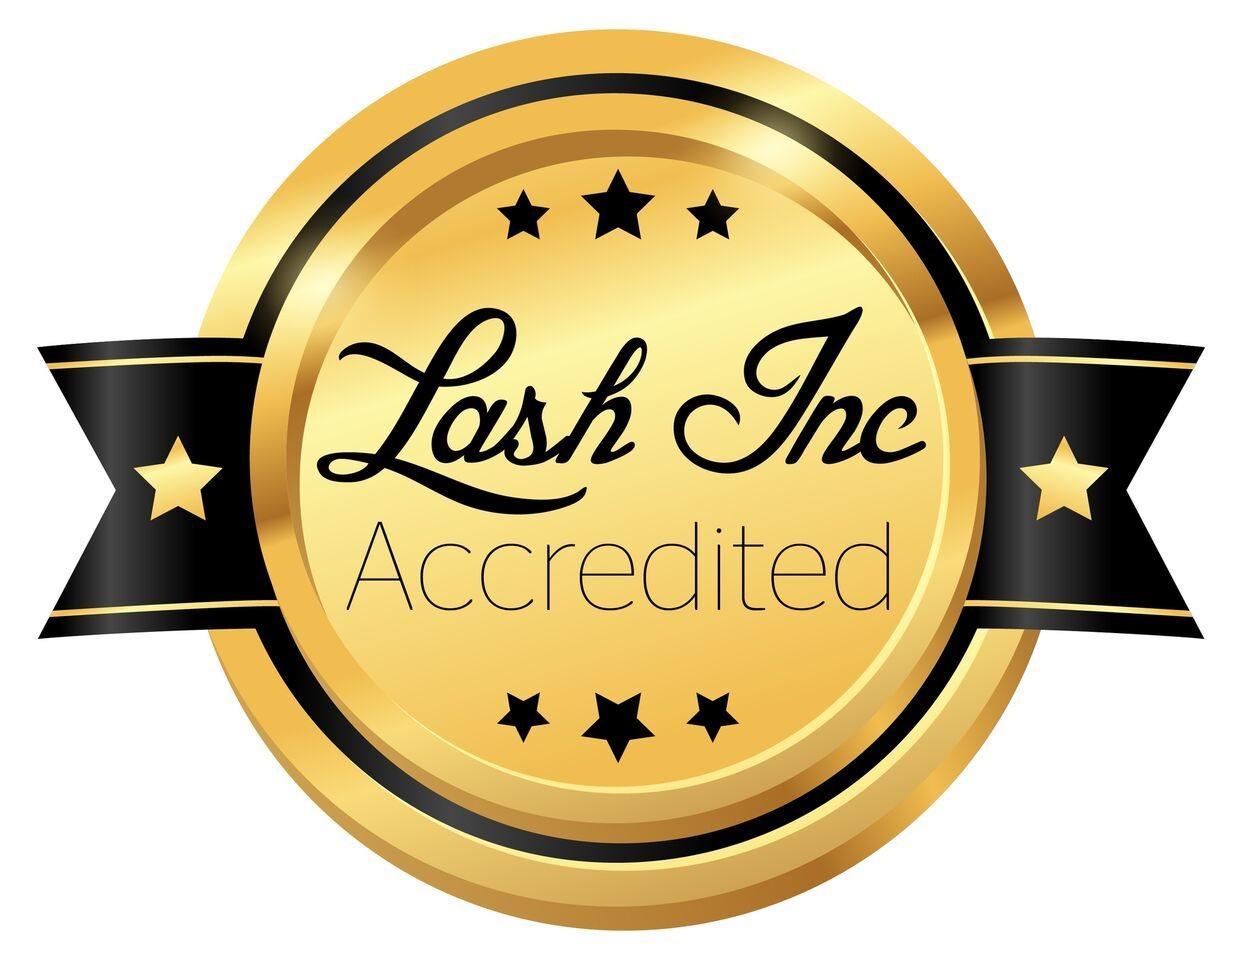 Lash Inc Multiple Course - Accreditation Application Fee